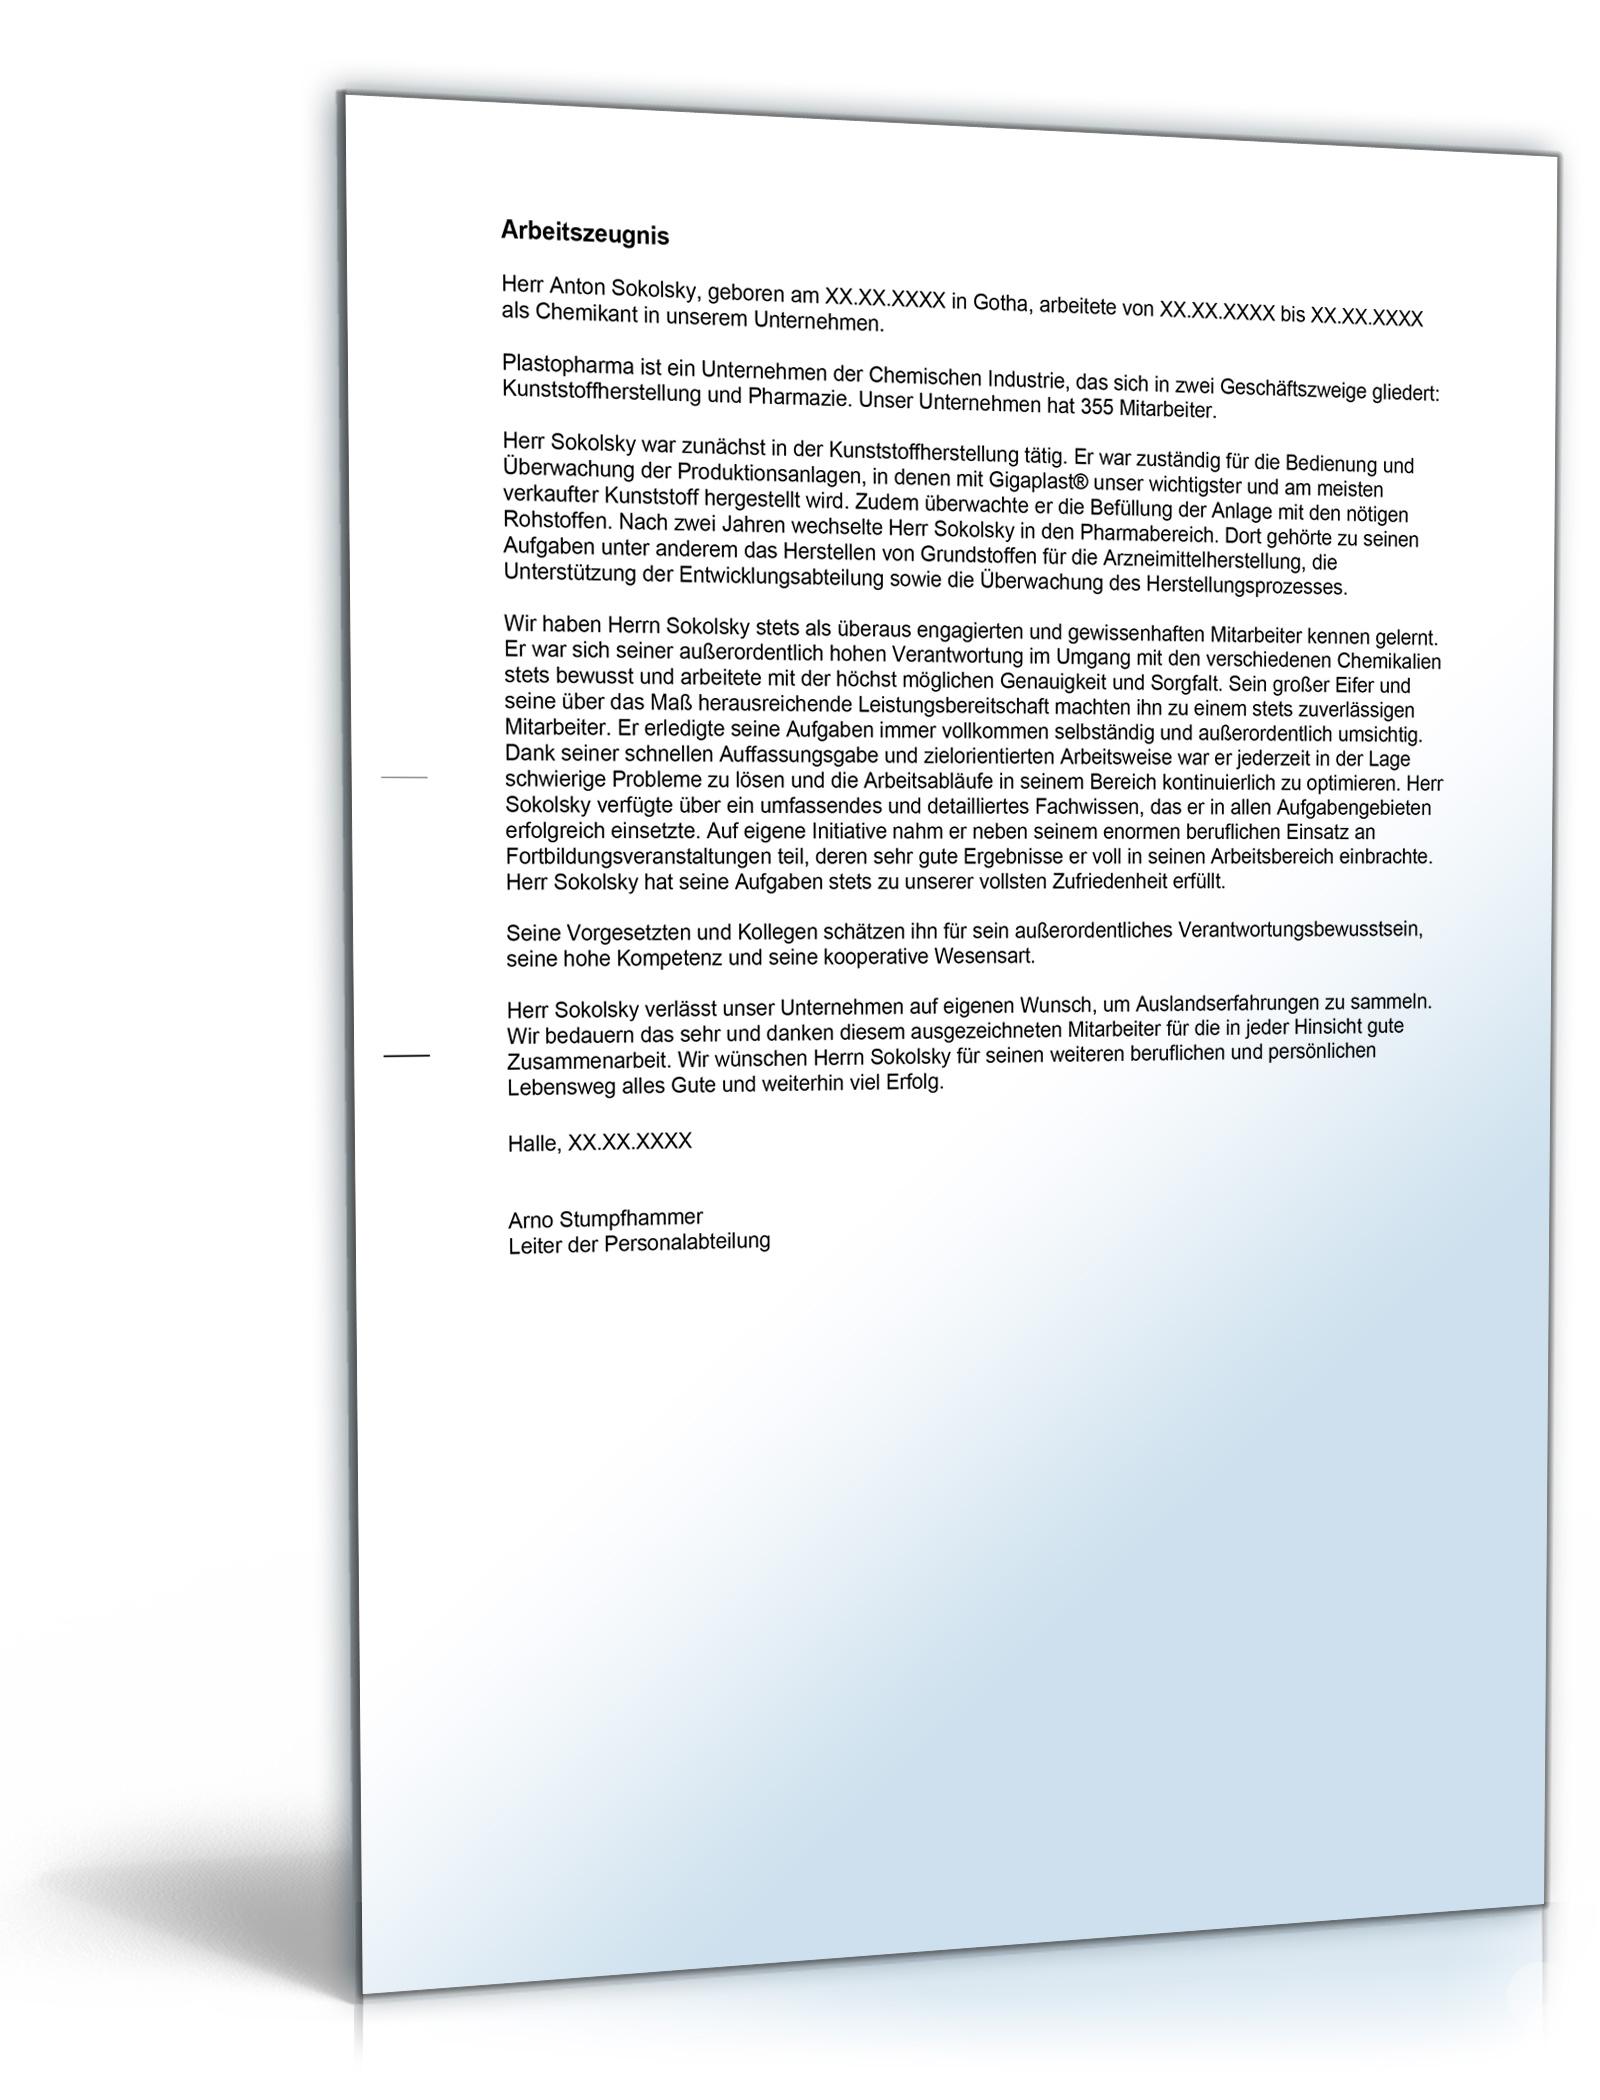 arbeitszeugnis chemikant note eins word dokument amazonde software - Bewerbung Chemikant